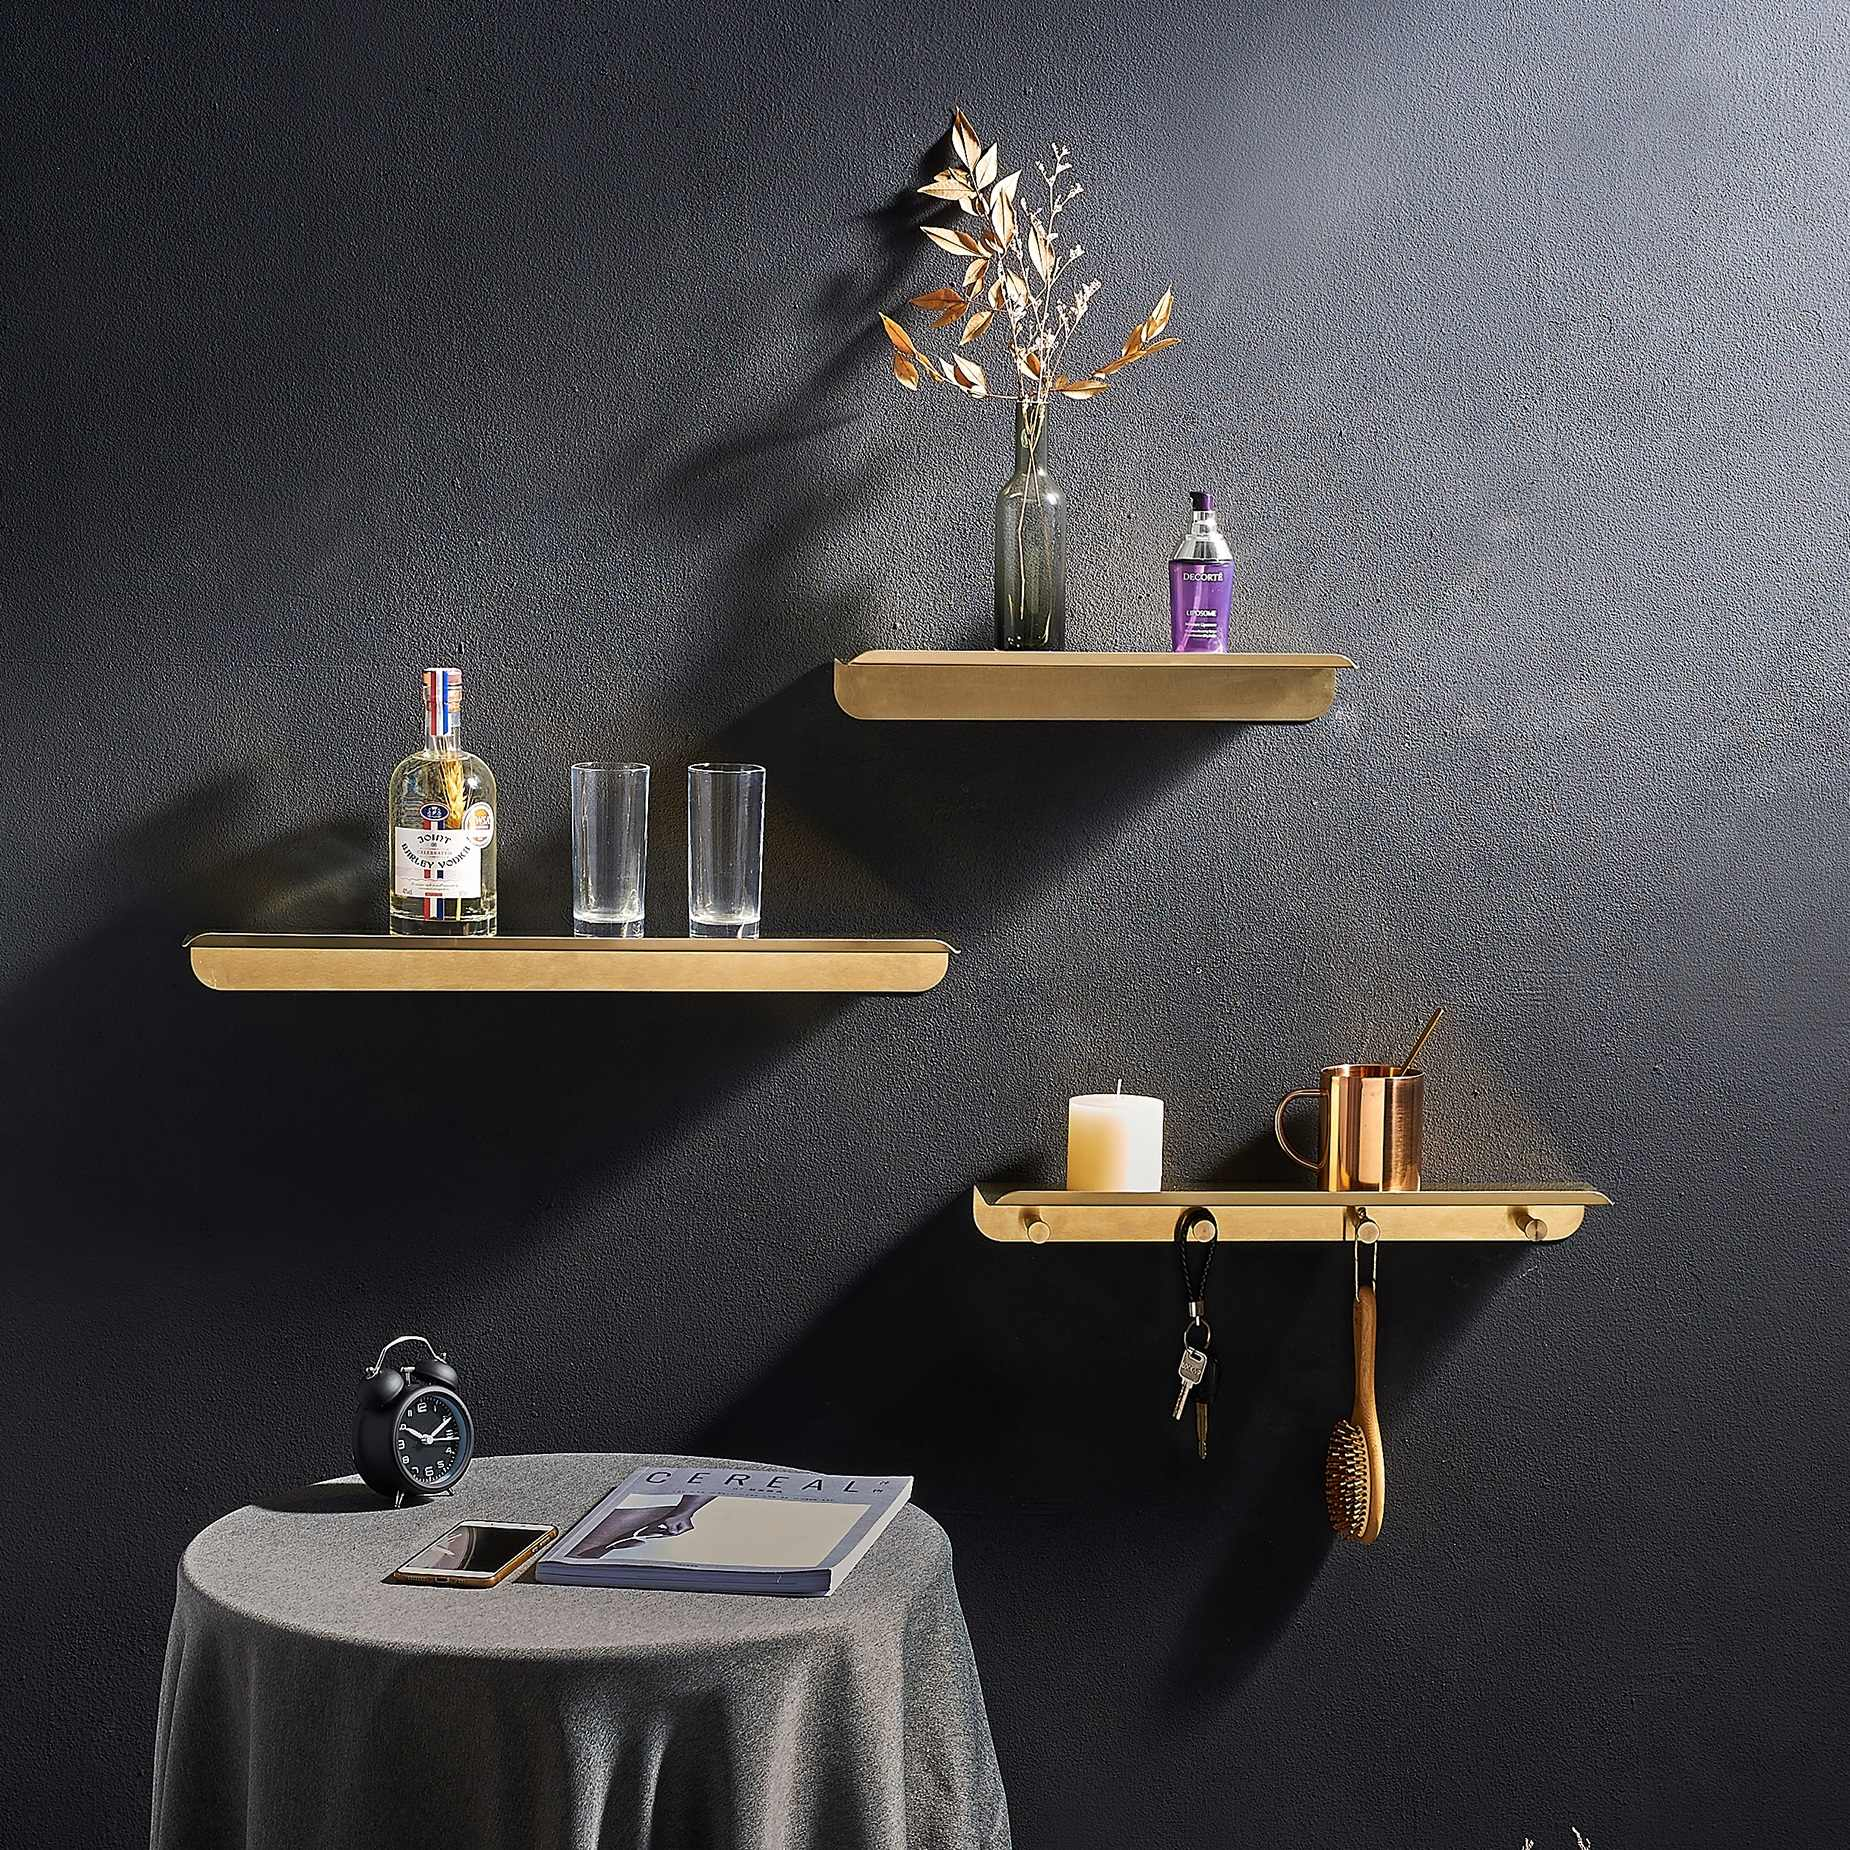 Floating Shelves Stainless Steel 304 Trays Bookshelves Display Modern Bedroom Wall Mounted Metal Storage Shelf Simple Design Decorative Shelves Aliexpress